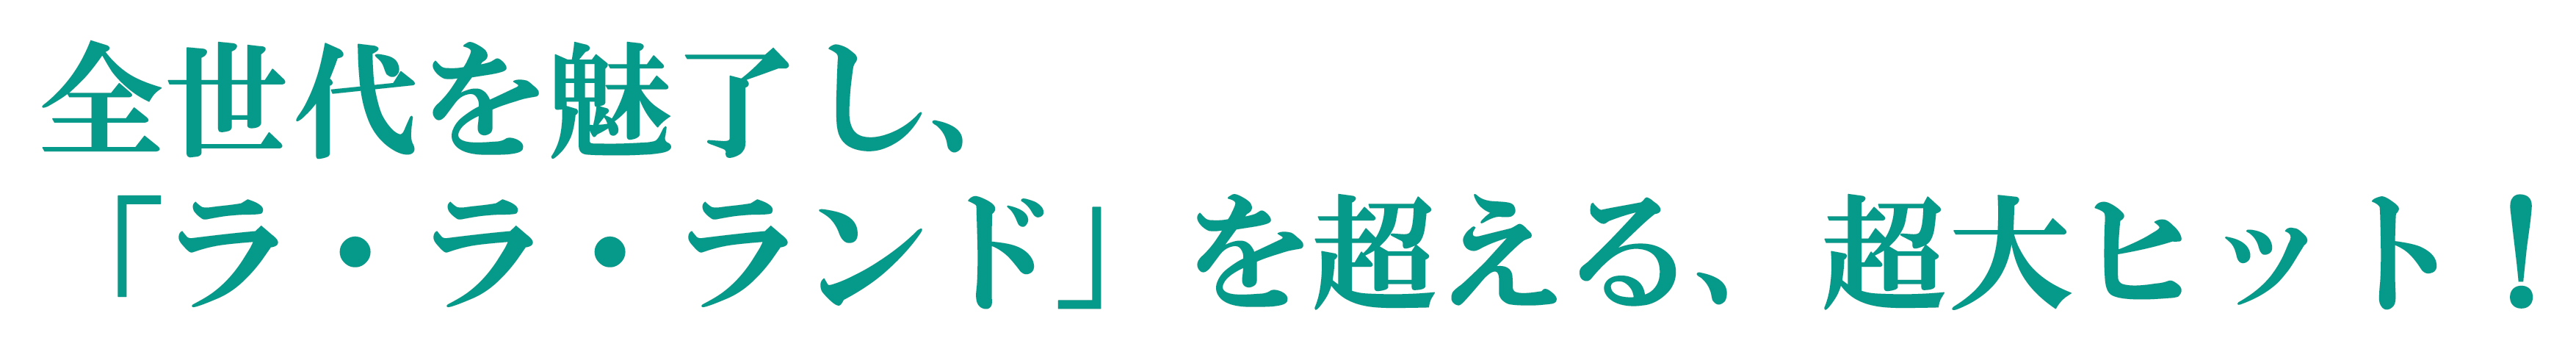 http://www.suncityhall.jp/%E3%83%89%E3%83%AA%E3%83%BC%E3%83%A0%E2%91%A4.jpg